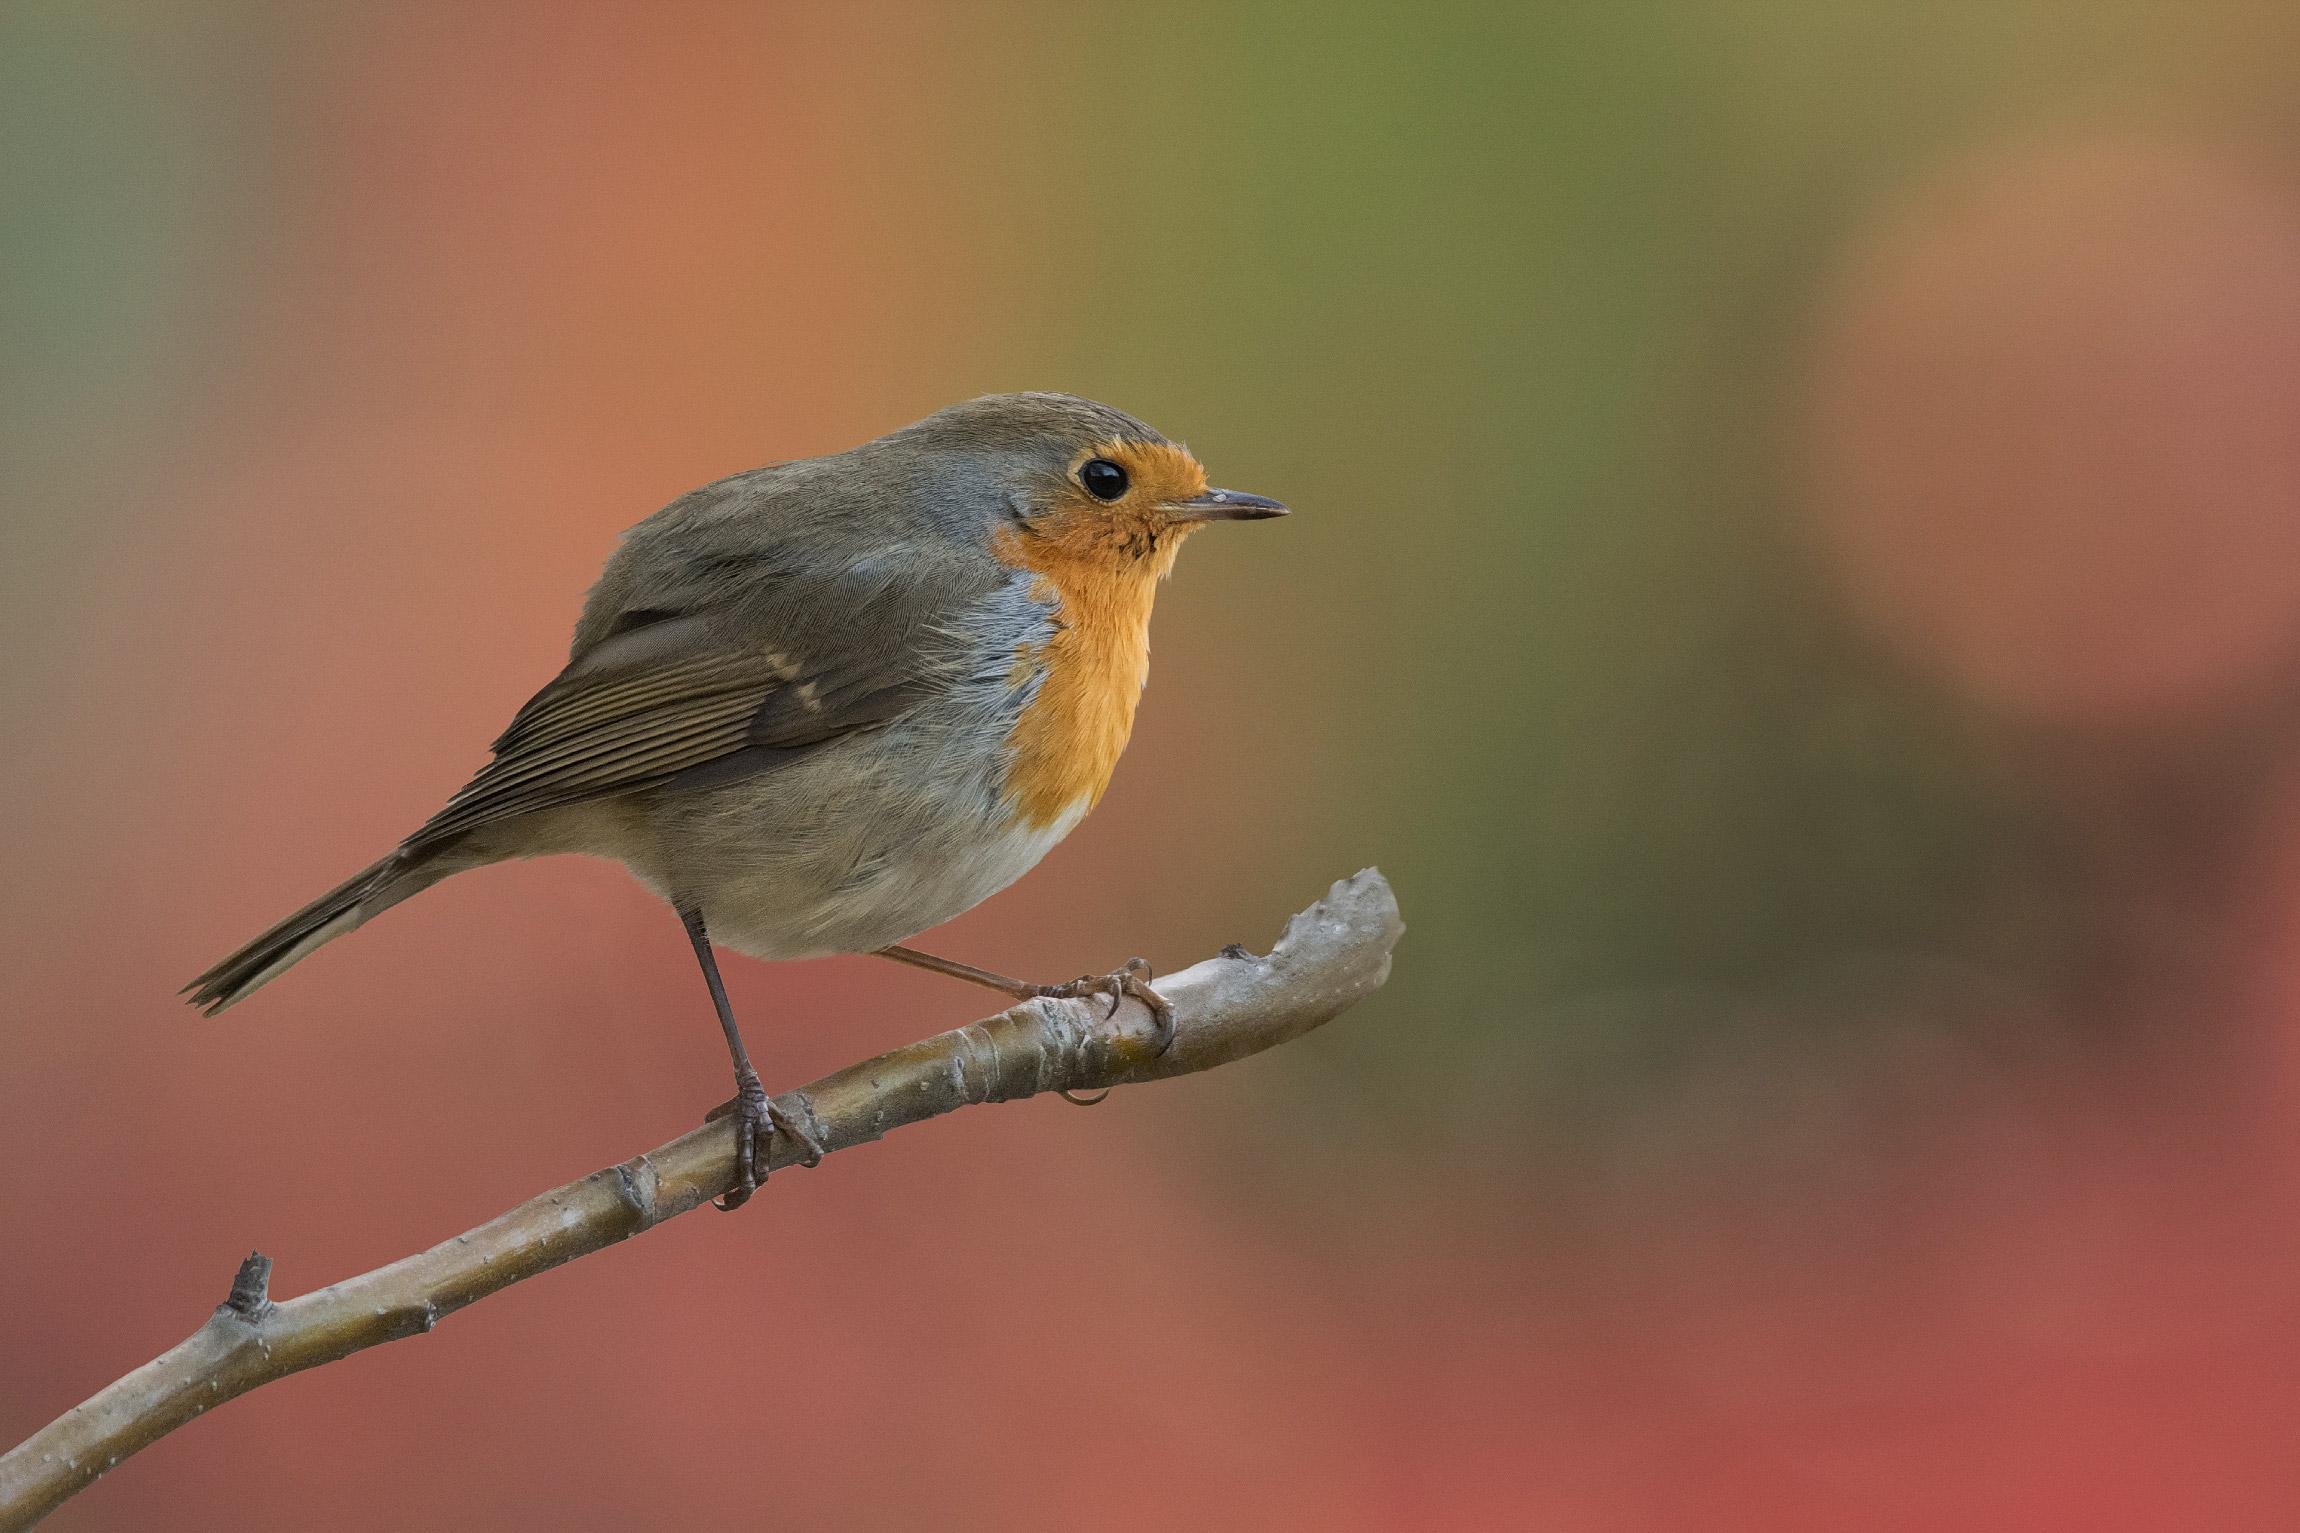 Robin is back...